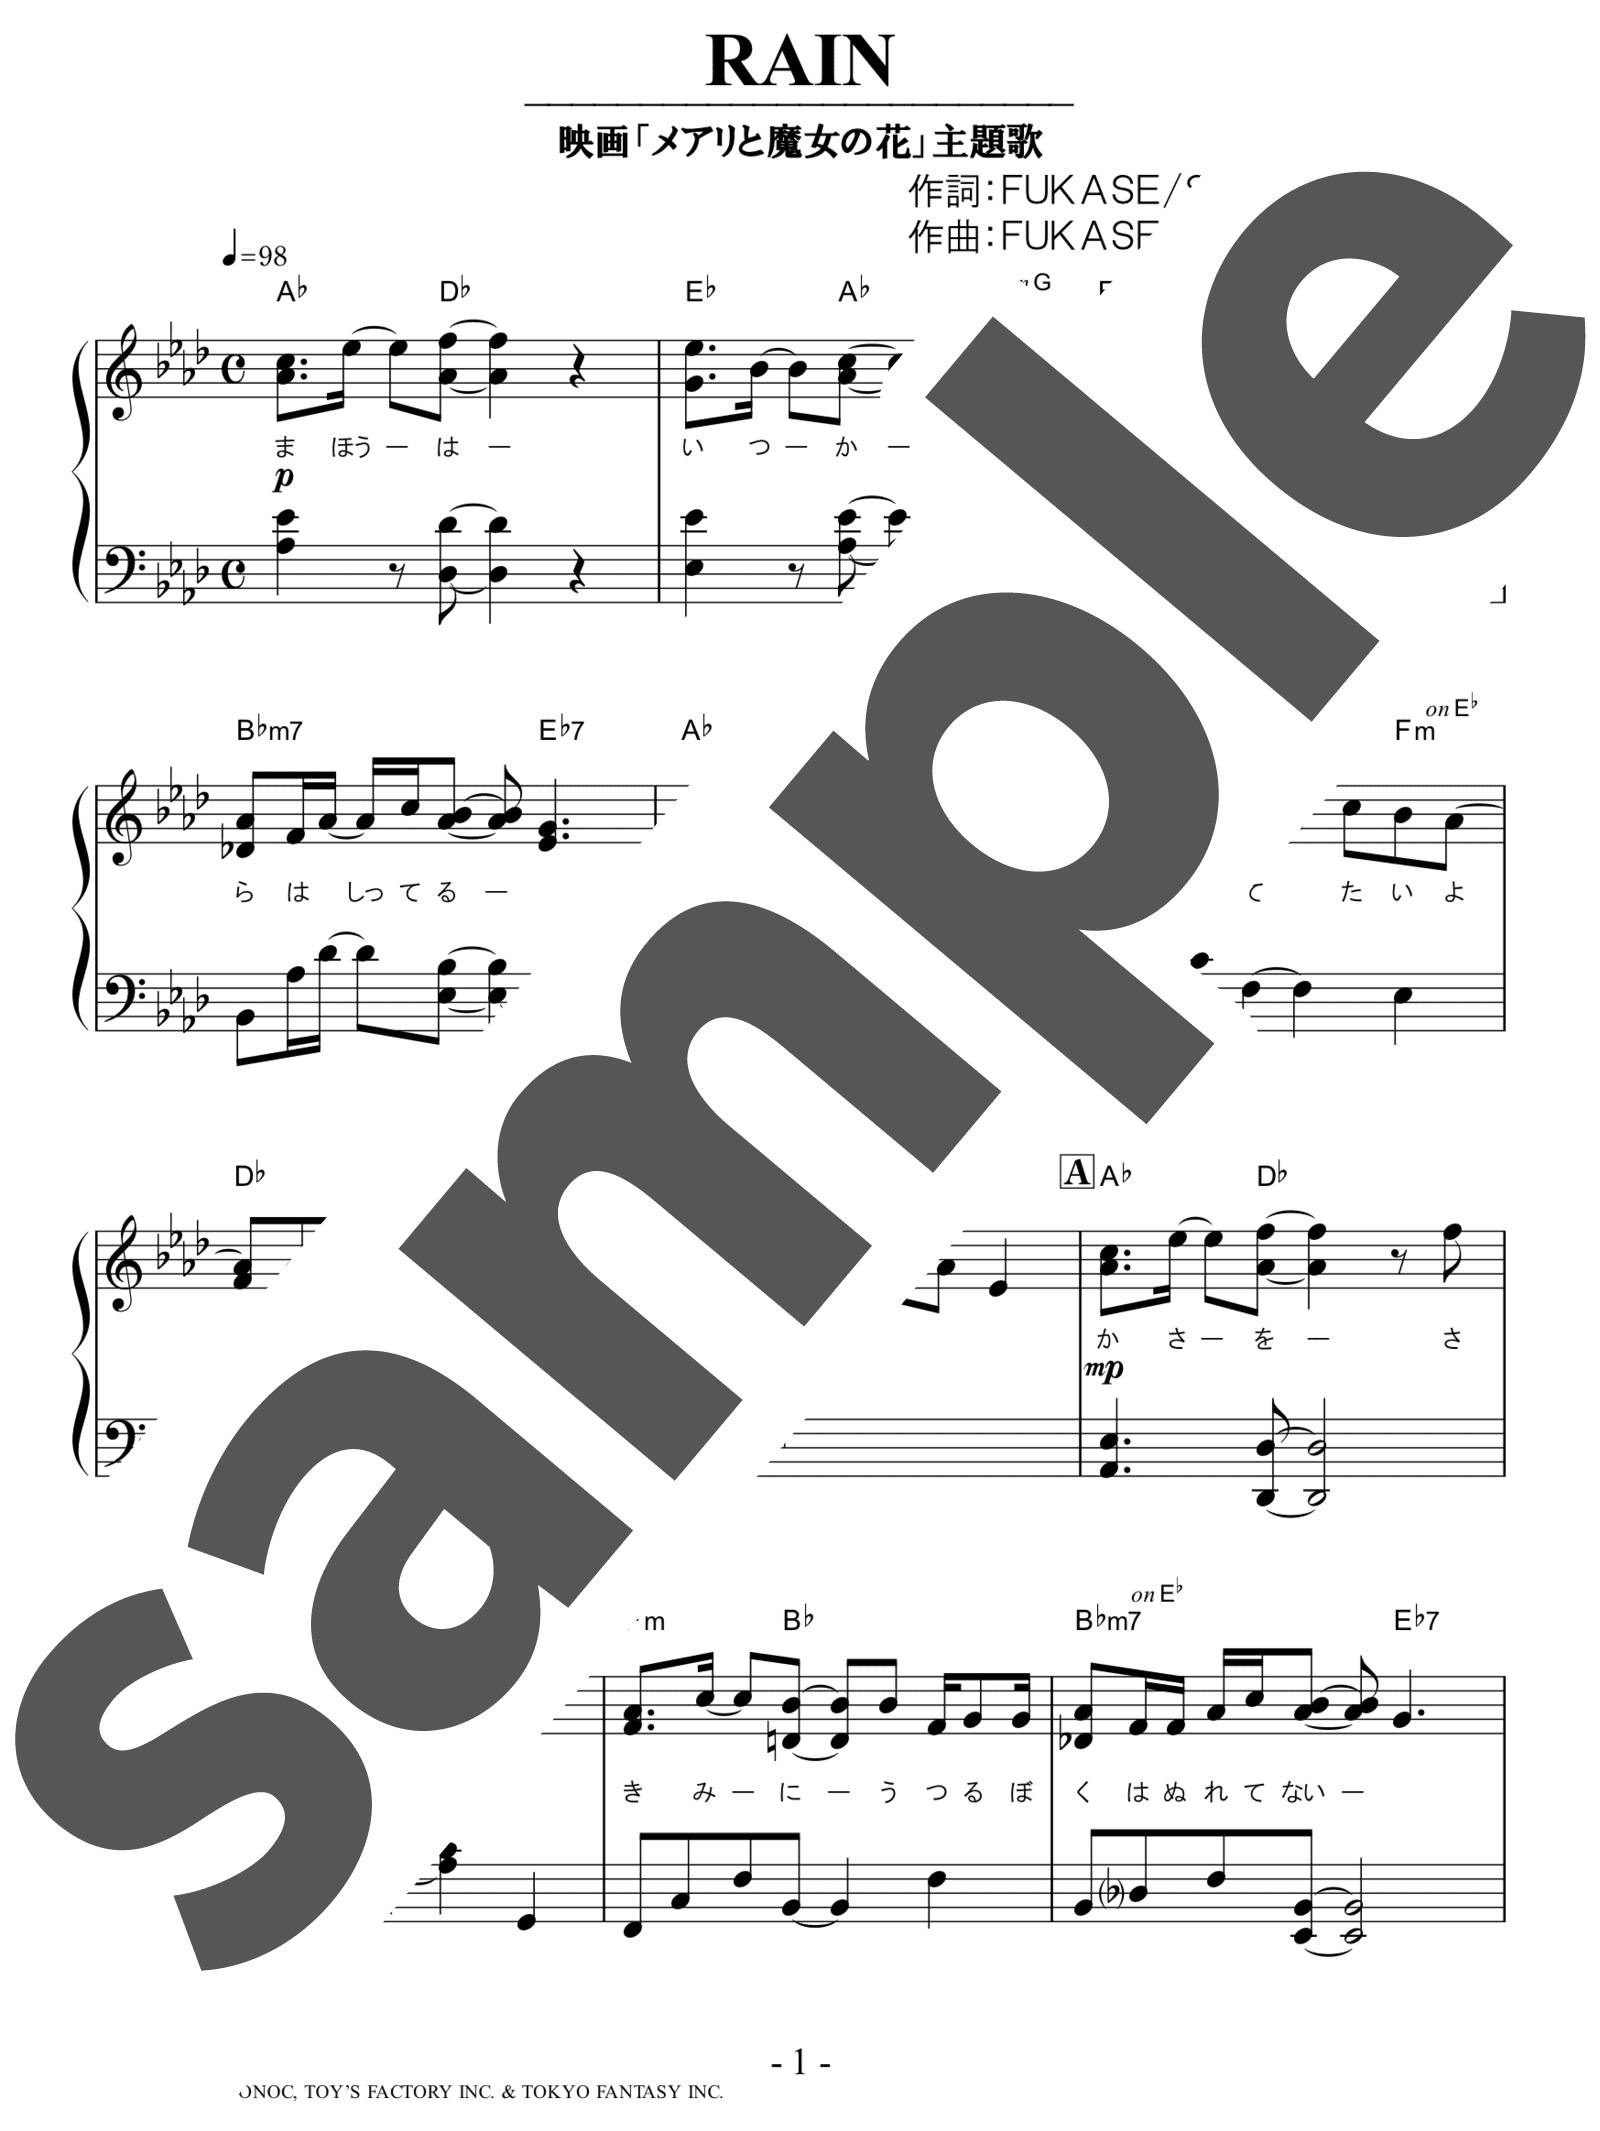 「RAIN -Arrange ver.-coverまふまふ」のサンプル楽譜